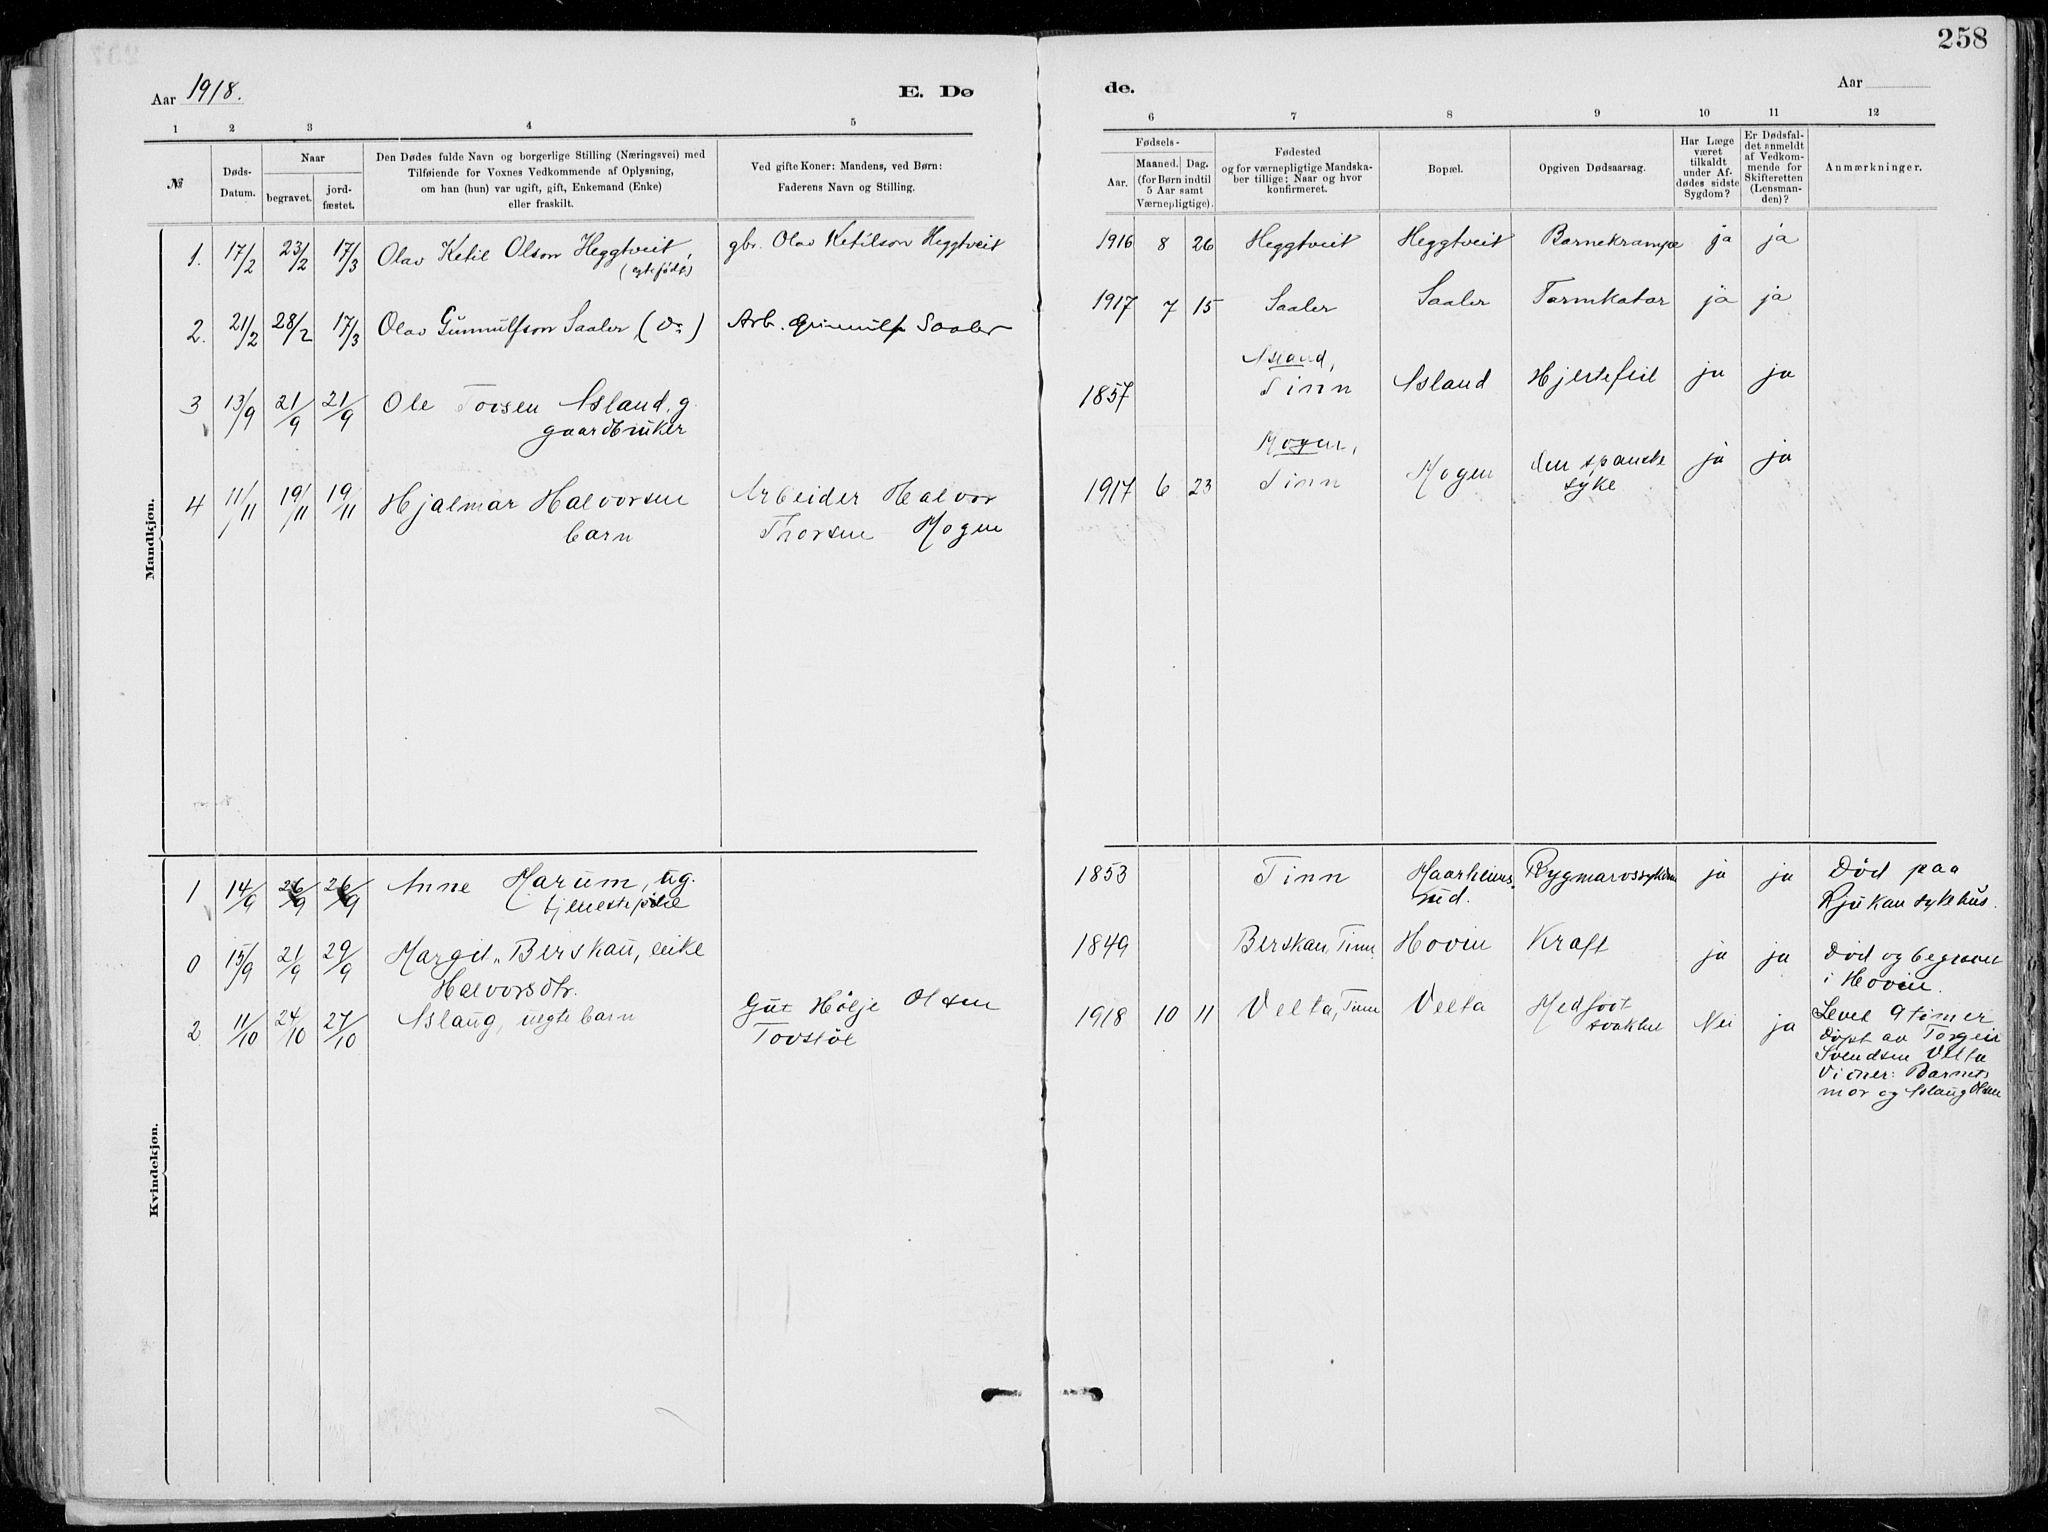 SAKO, Tinn kirkebøker, F/Fa/L0007: Ministerialbok nr. I 7, 1878-1922, s. 258